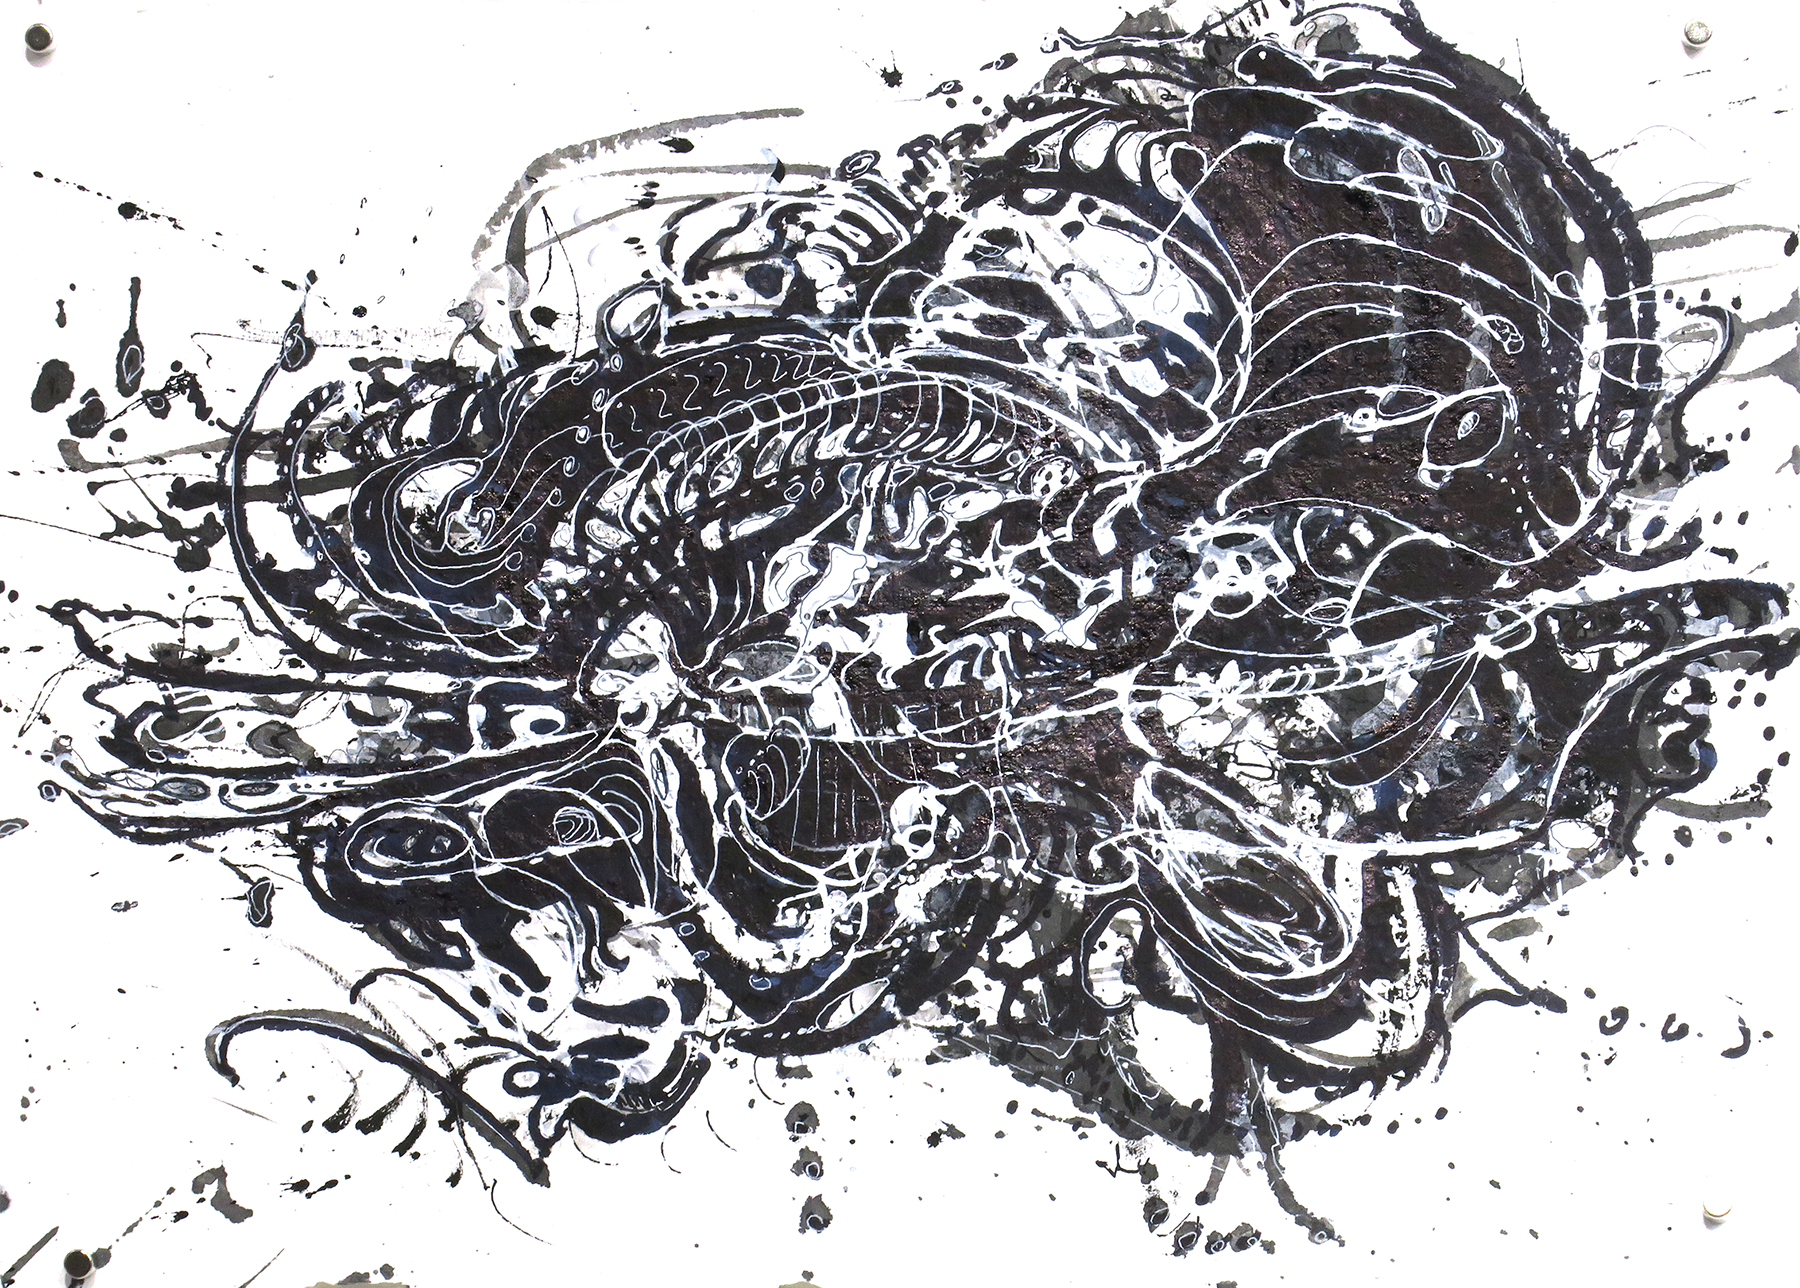 Kathryn Hart, Daunting Transitions, Krakow, Ink Drawing 2